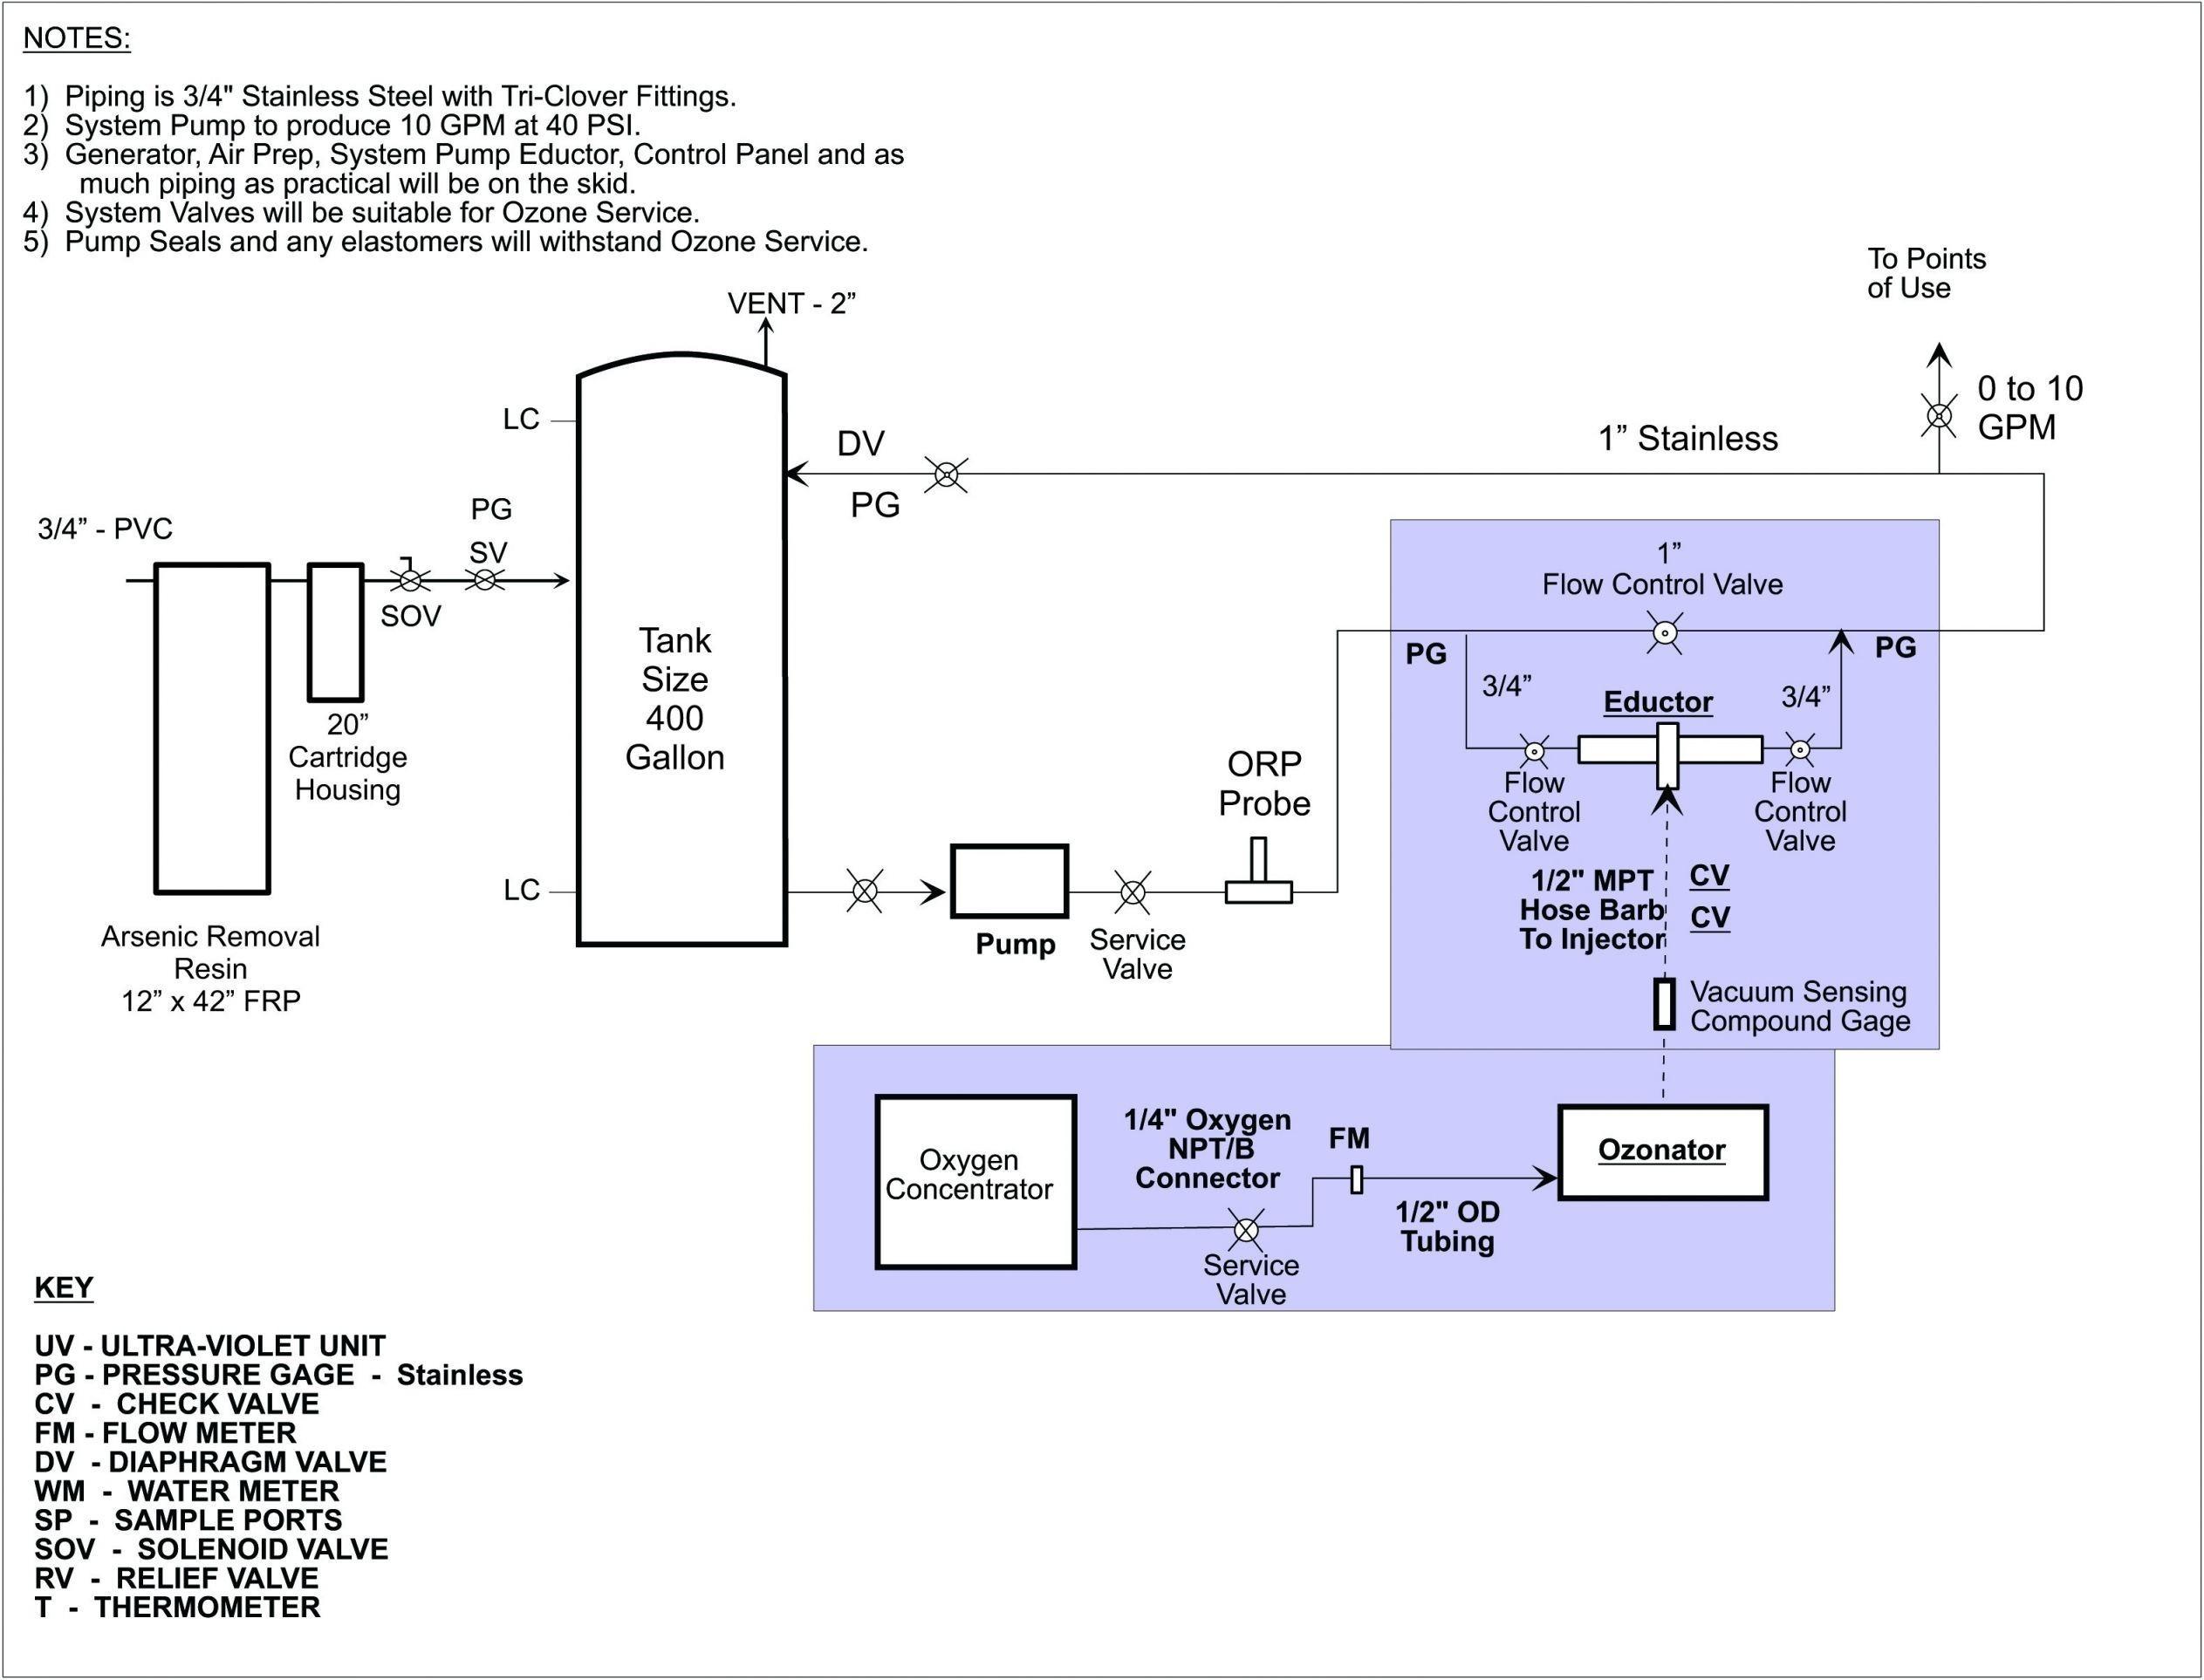 Well Pump Control Box Wiring Diagram Well Pump Control Box Wiring Diagram Exatinfo